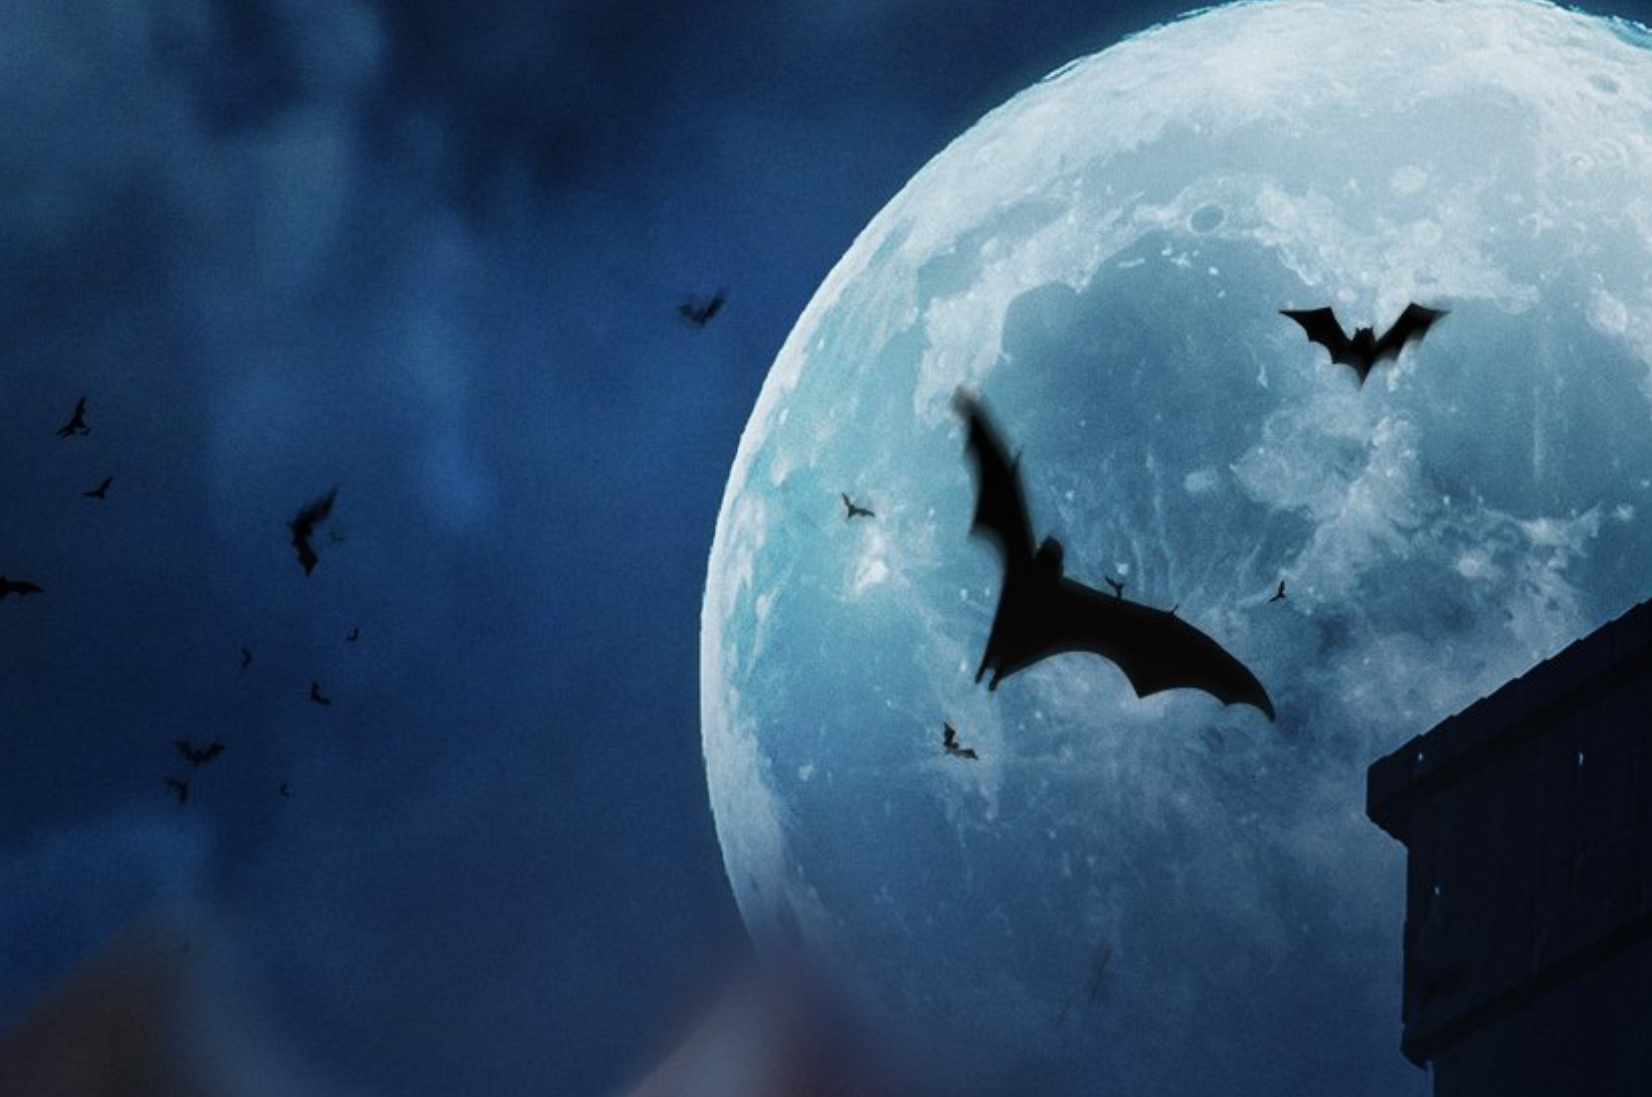 PUBG Mobile Patch 090 Has Finally Released Adding Erangel Night Mode Halloween Spectator